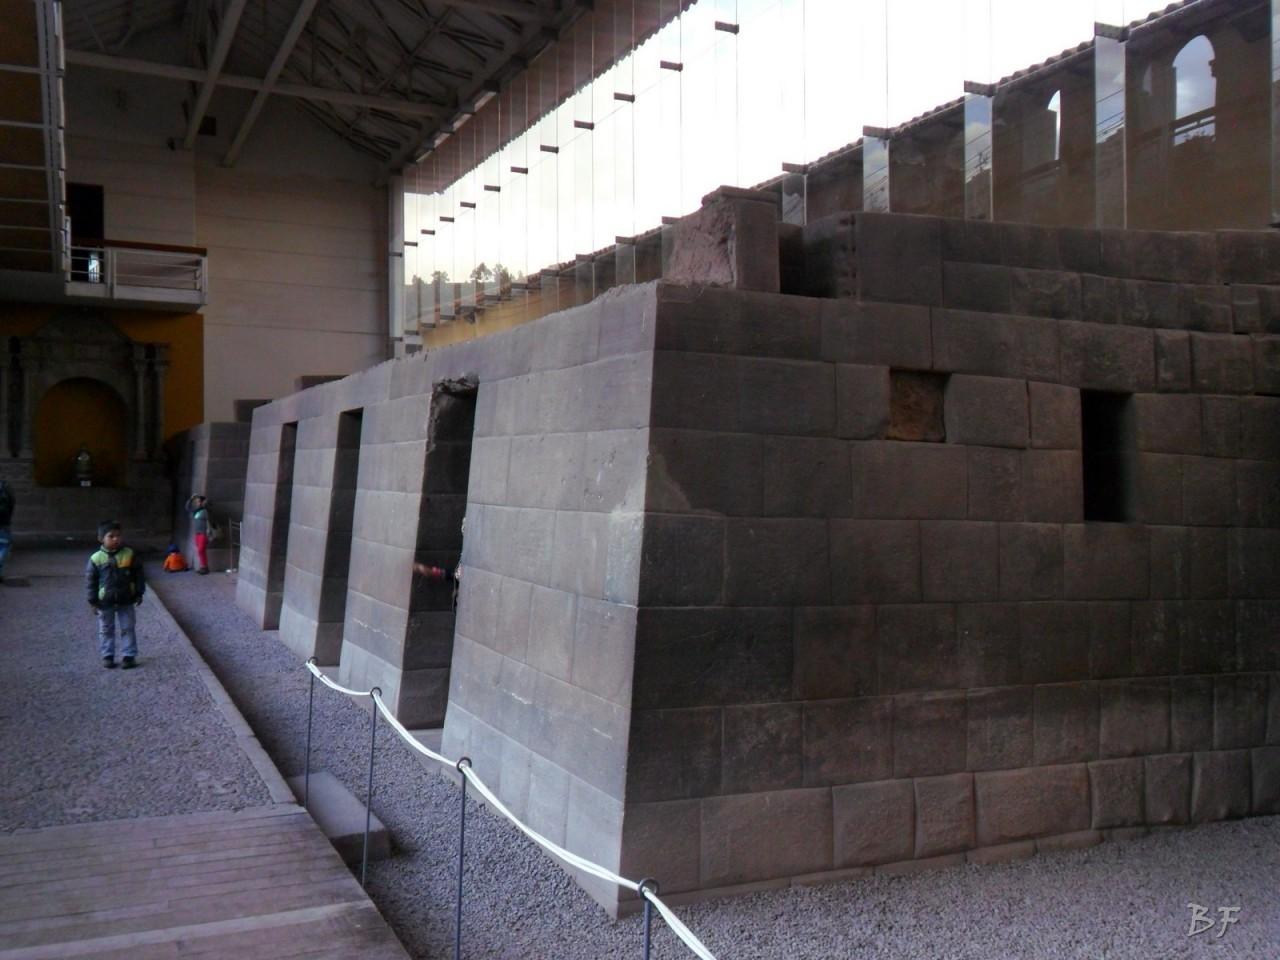 Mura-Poligonali-Megaliti-Tempio-Coricancha-Cusco-Perù-42